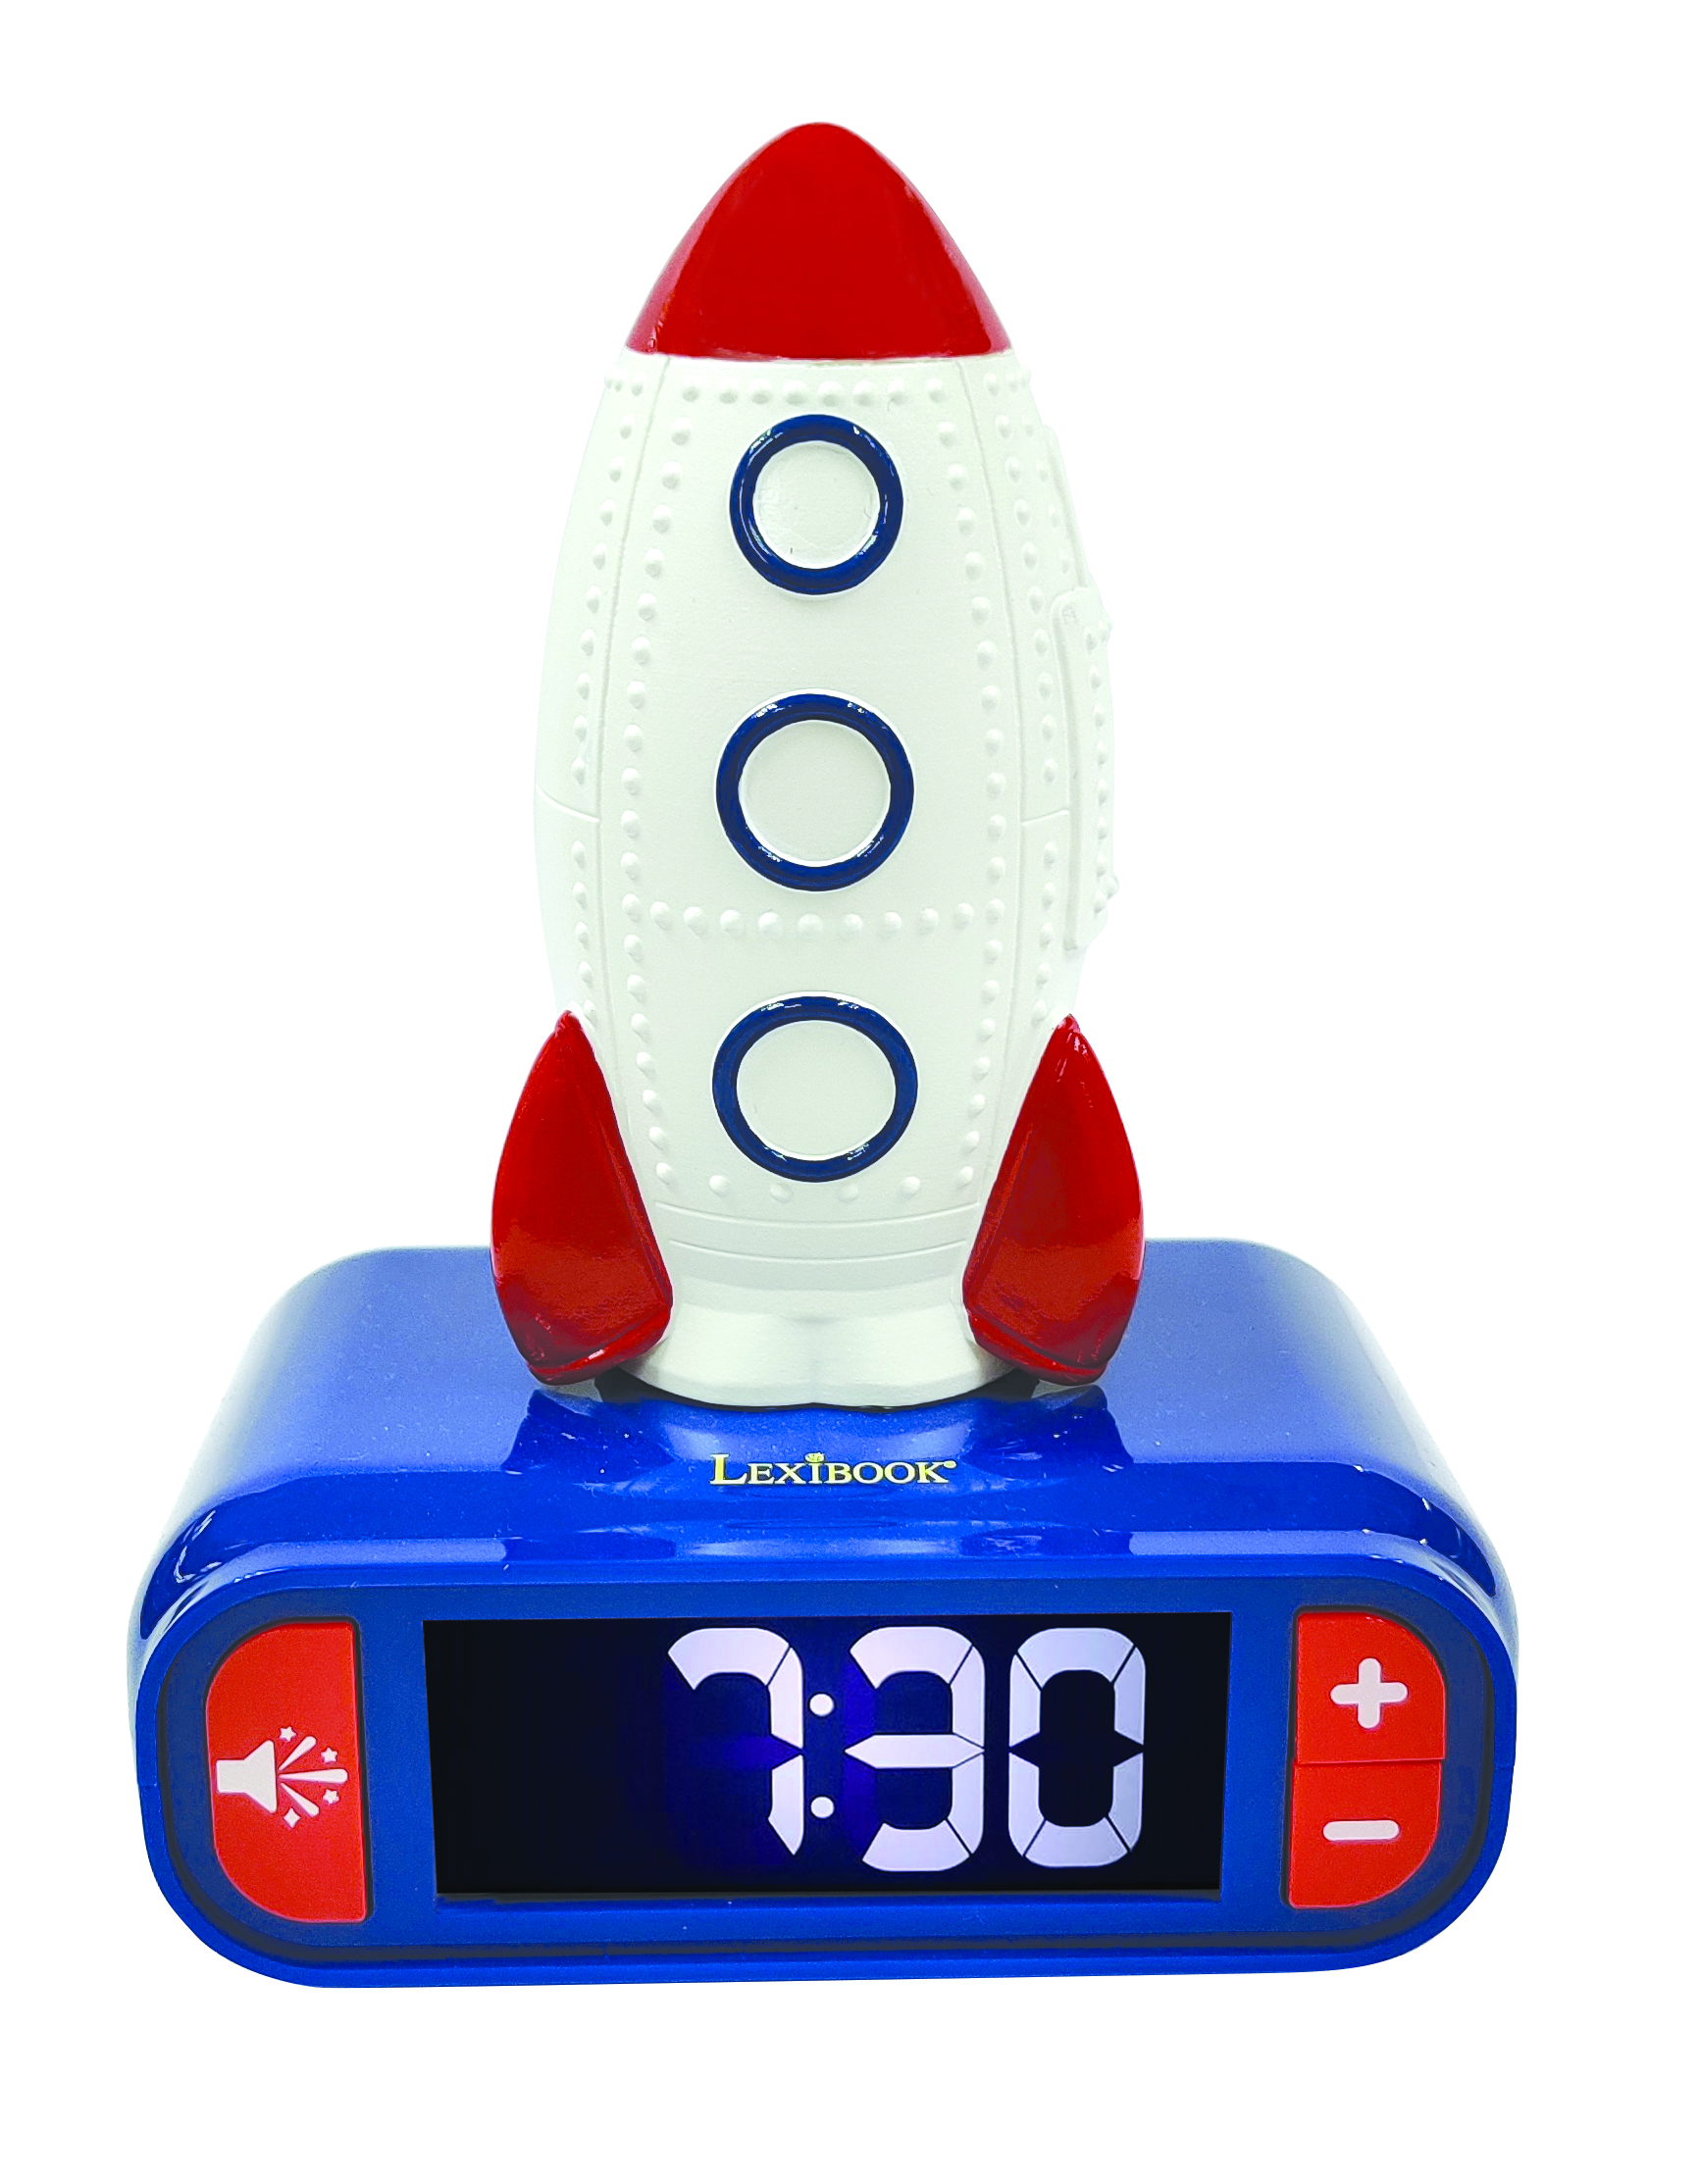 Lexibook - Alarm Clock with Rocket 3D design Night Light and sound effects (RL800SPC)